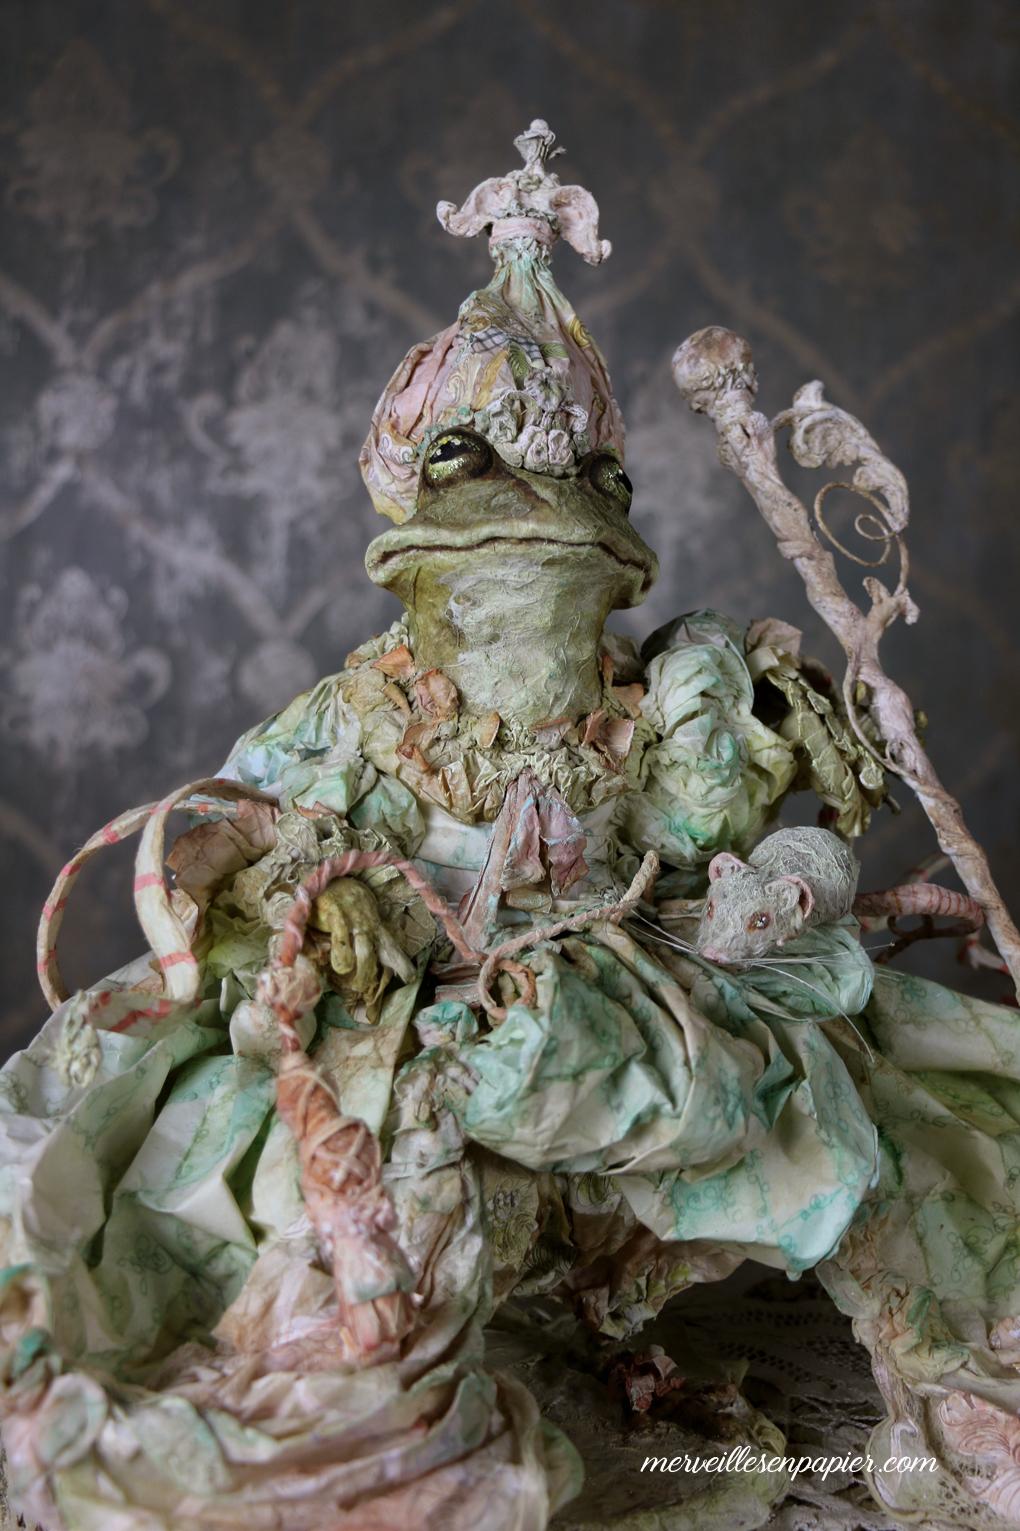 The benevolent Frog - Madame d'Aulnoy